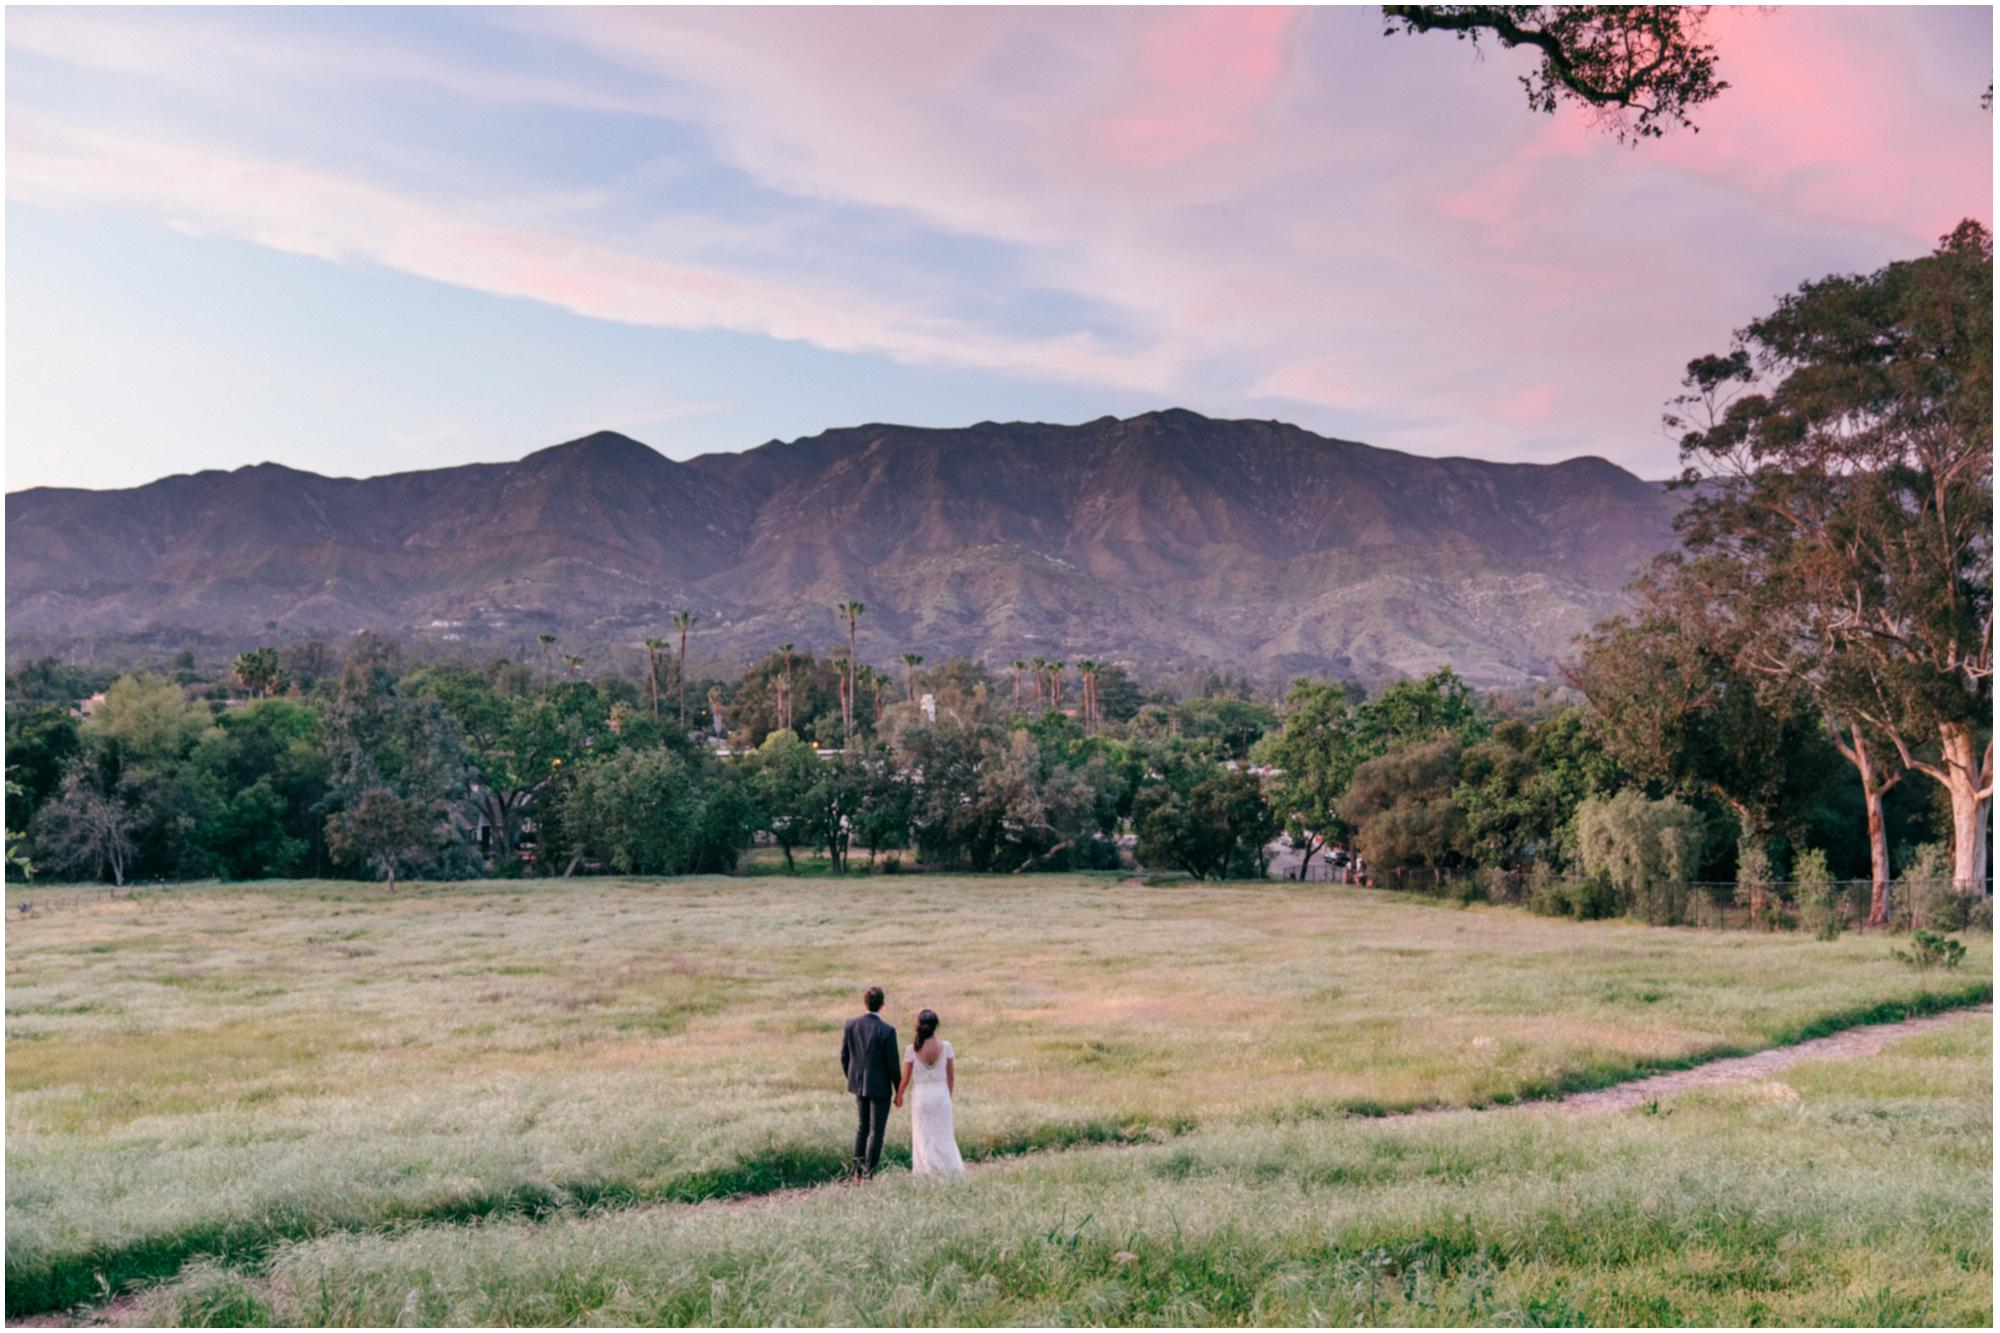 Los_Angeles_Wedding_Photographer_Ojai_Wedding_Pinnel_Photography-28.jpg